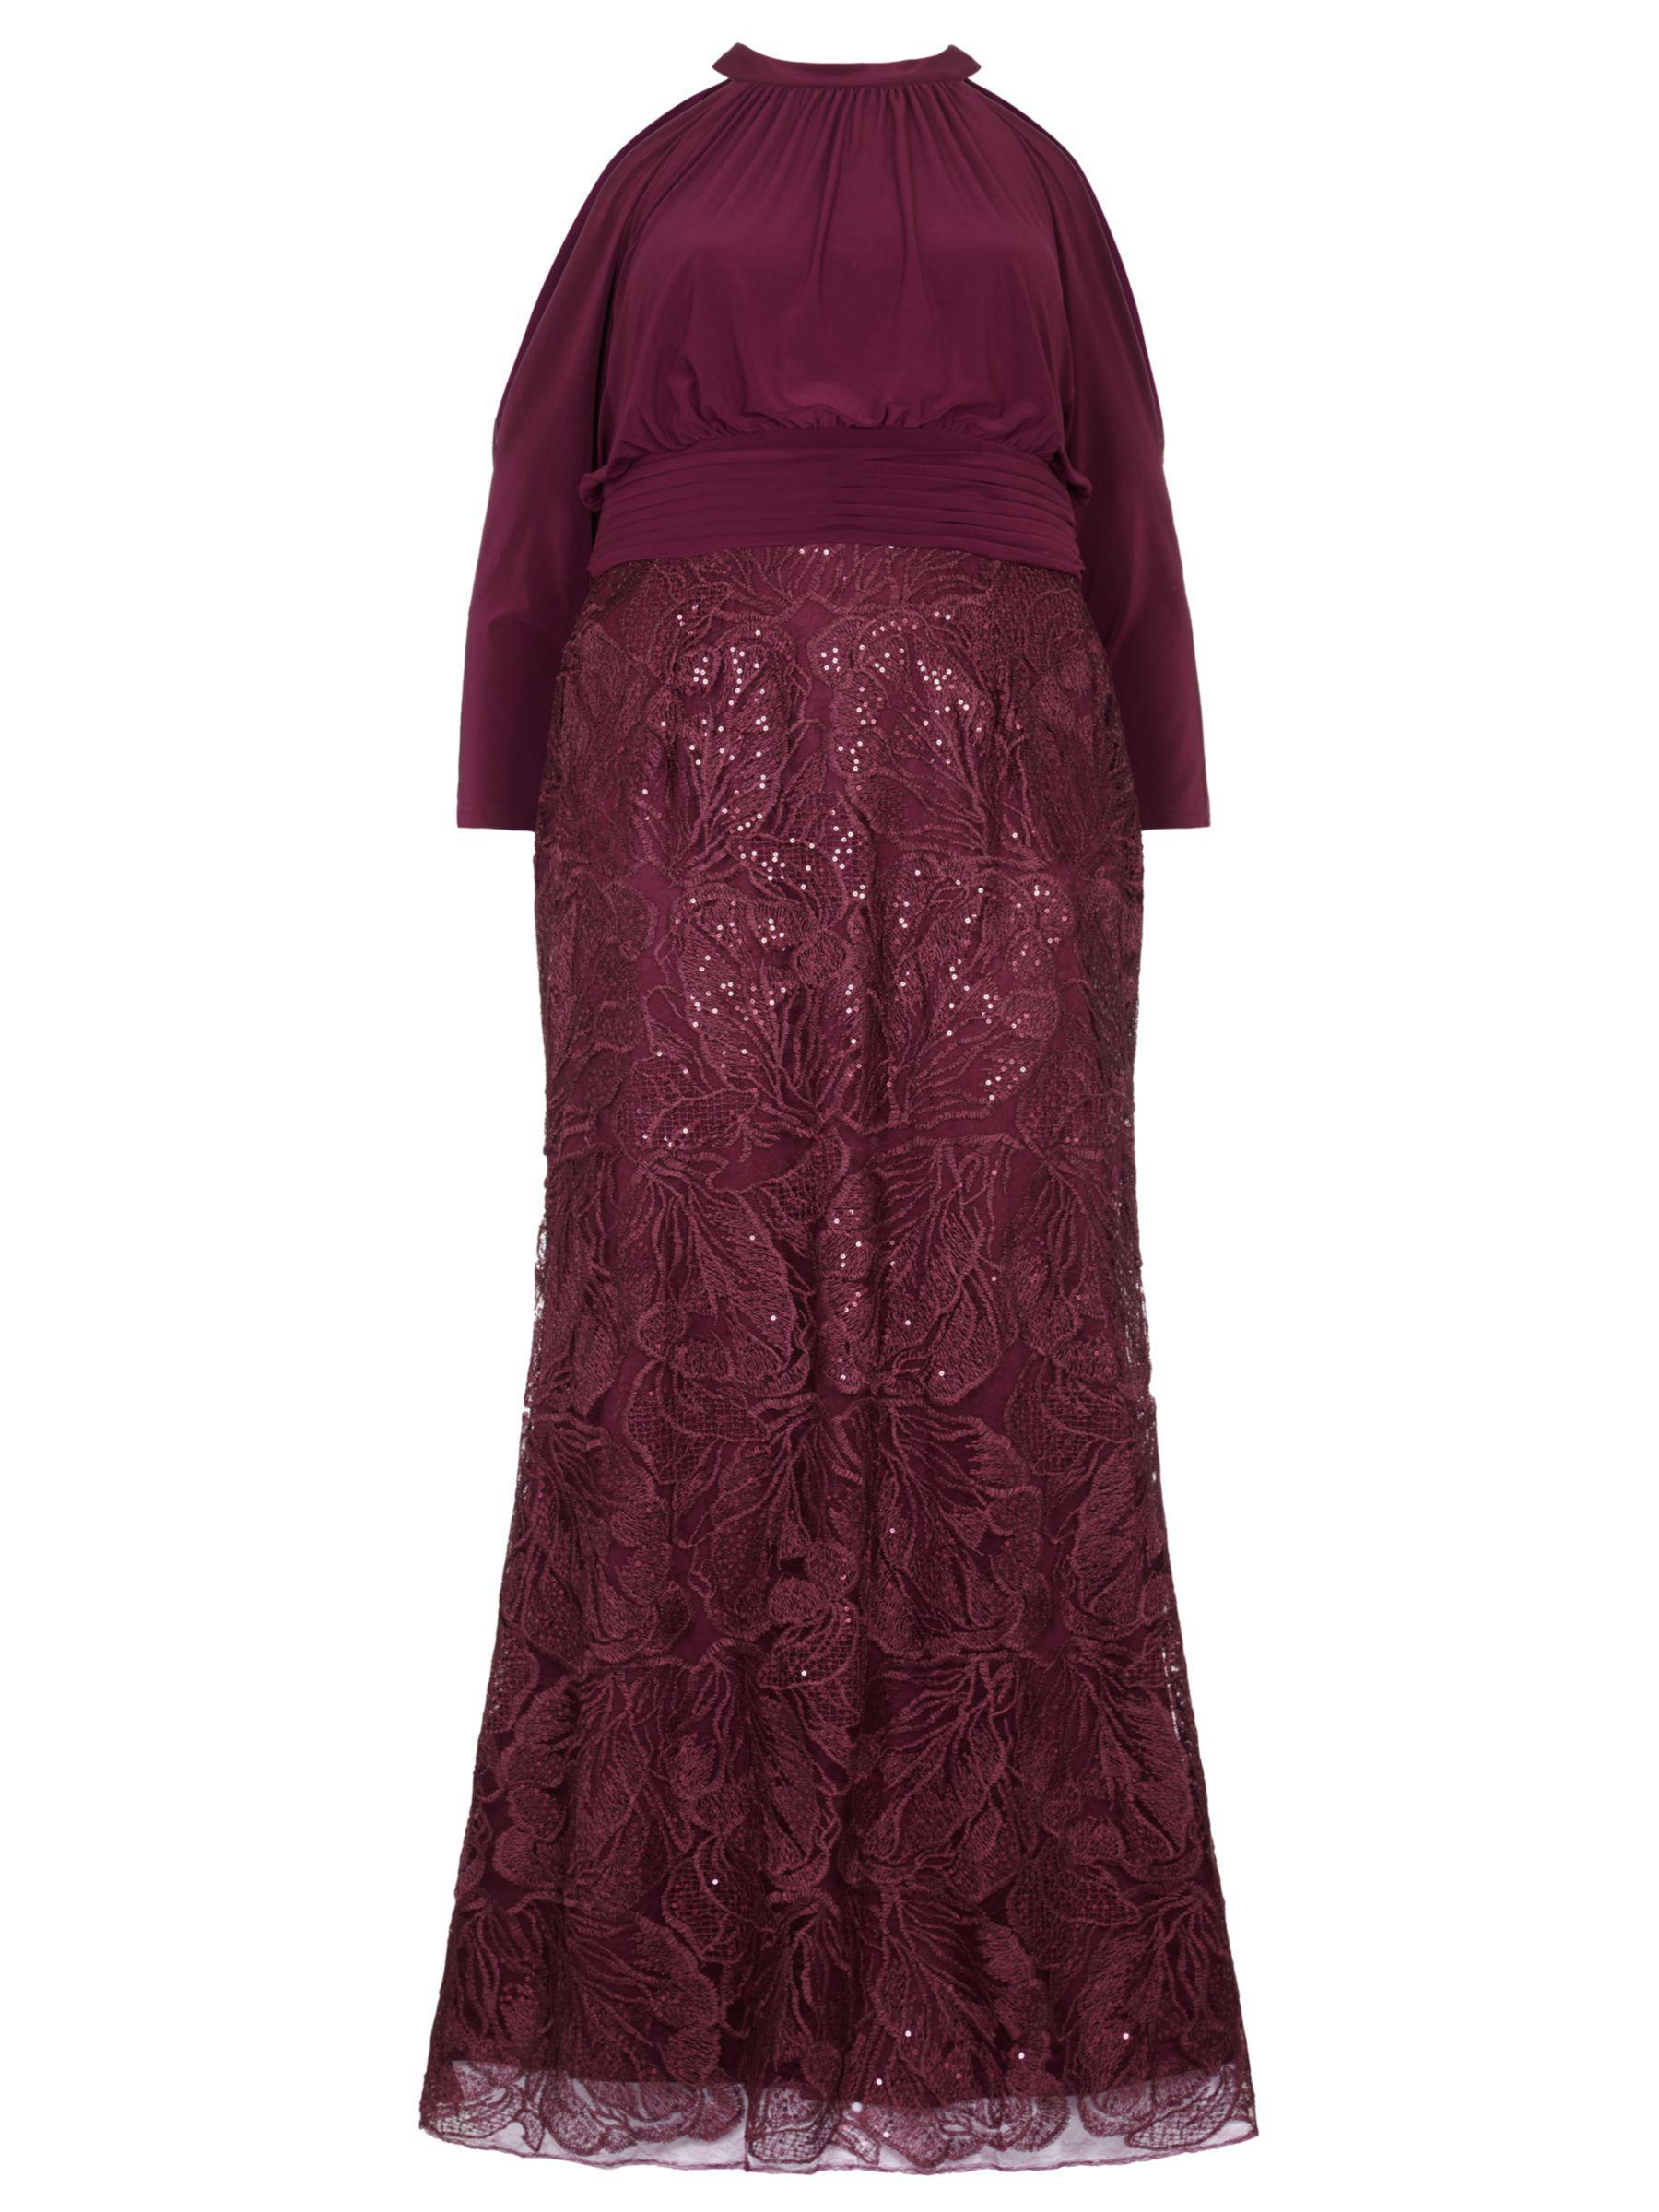 Lyst Adrianna Papell Plus Size Long Sequin Blouson Dress